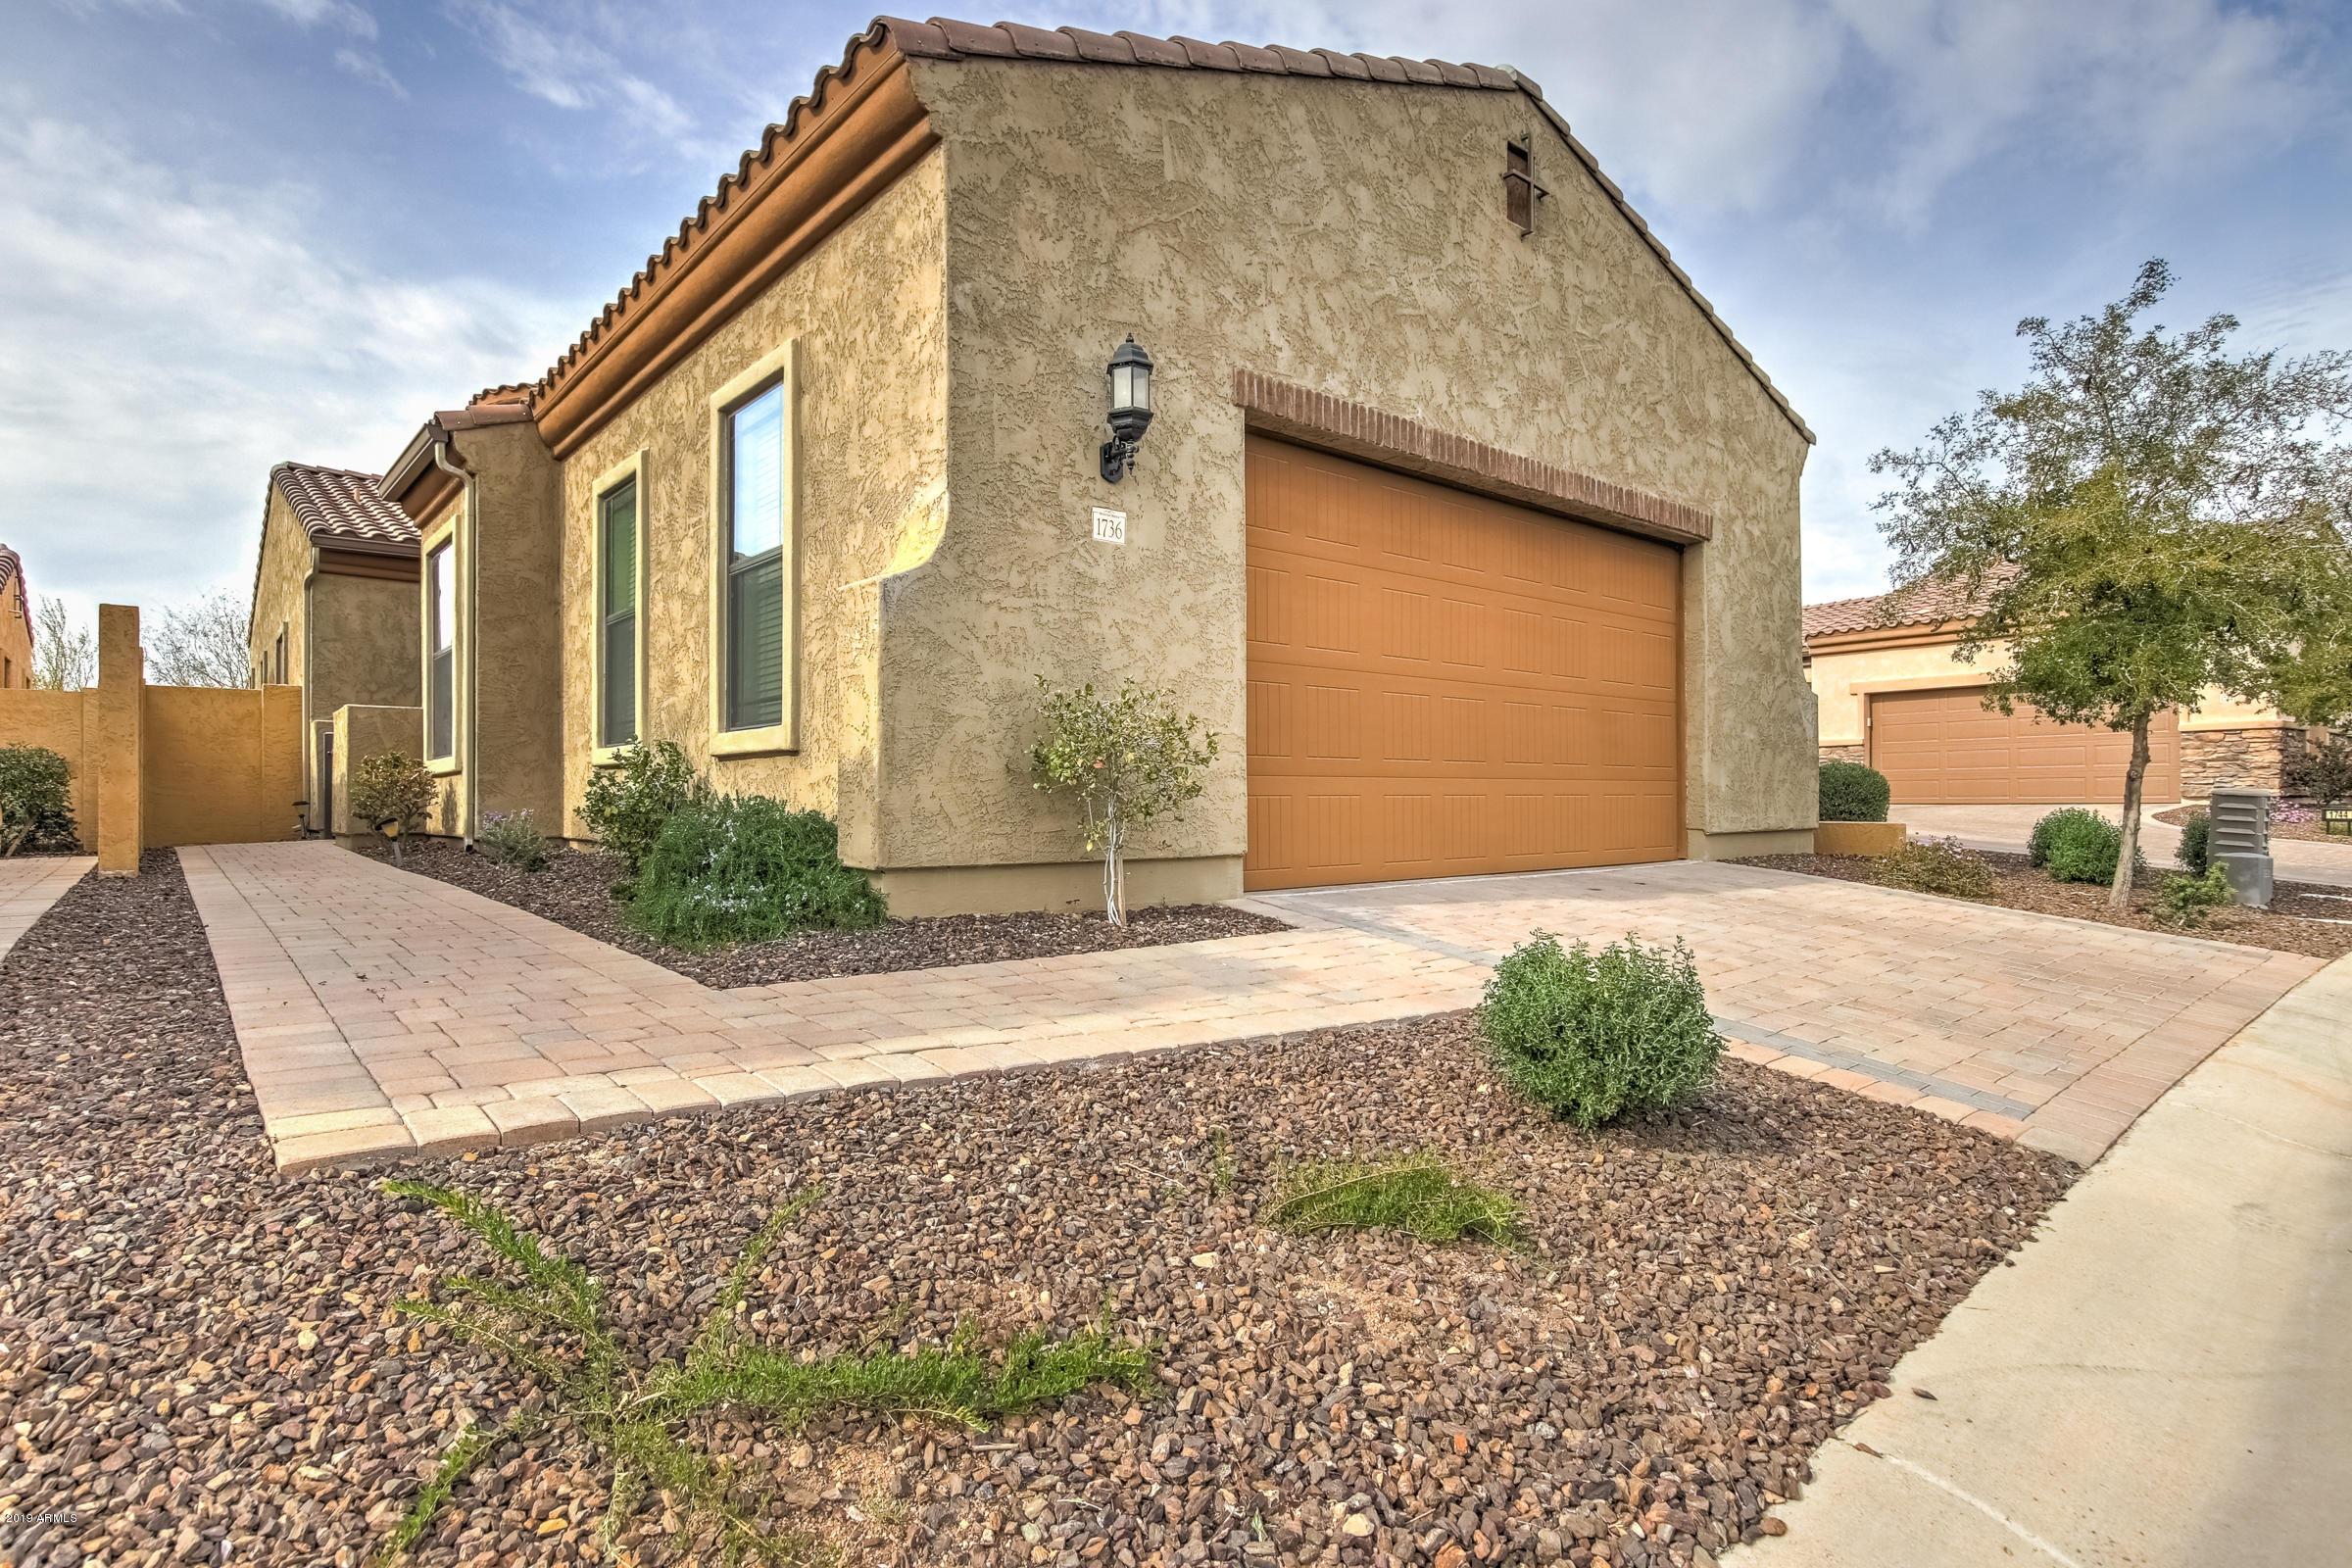 Photo of 1736 N TROWBRIDGE --, Mesa, AZ 85207